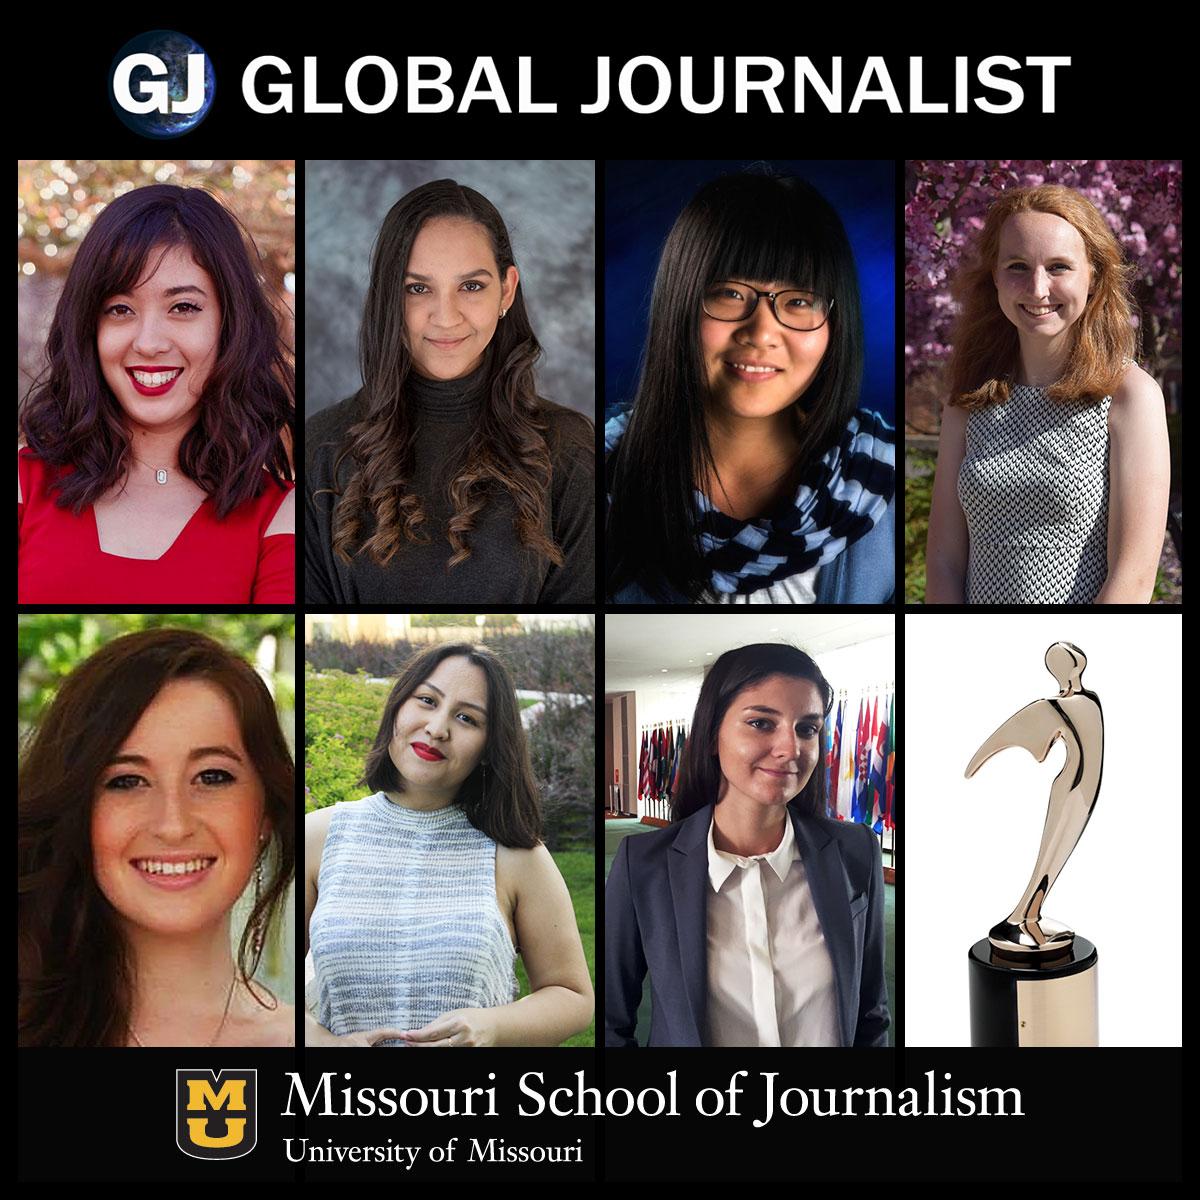 Aleissa Bleyl, Maria Fernanda Callejon, Jinghong Chen, Lily Cusack, Rachel Foster-Gimbel, Safiya Sadr, Denitsa Tsekova